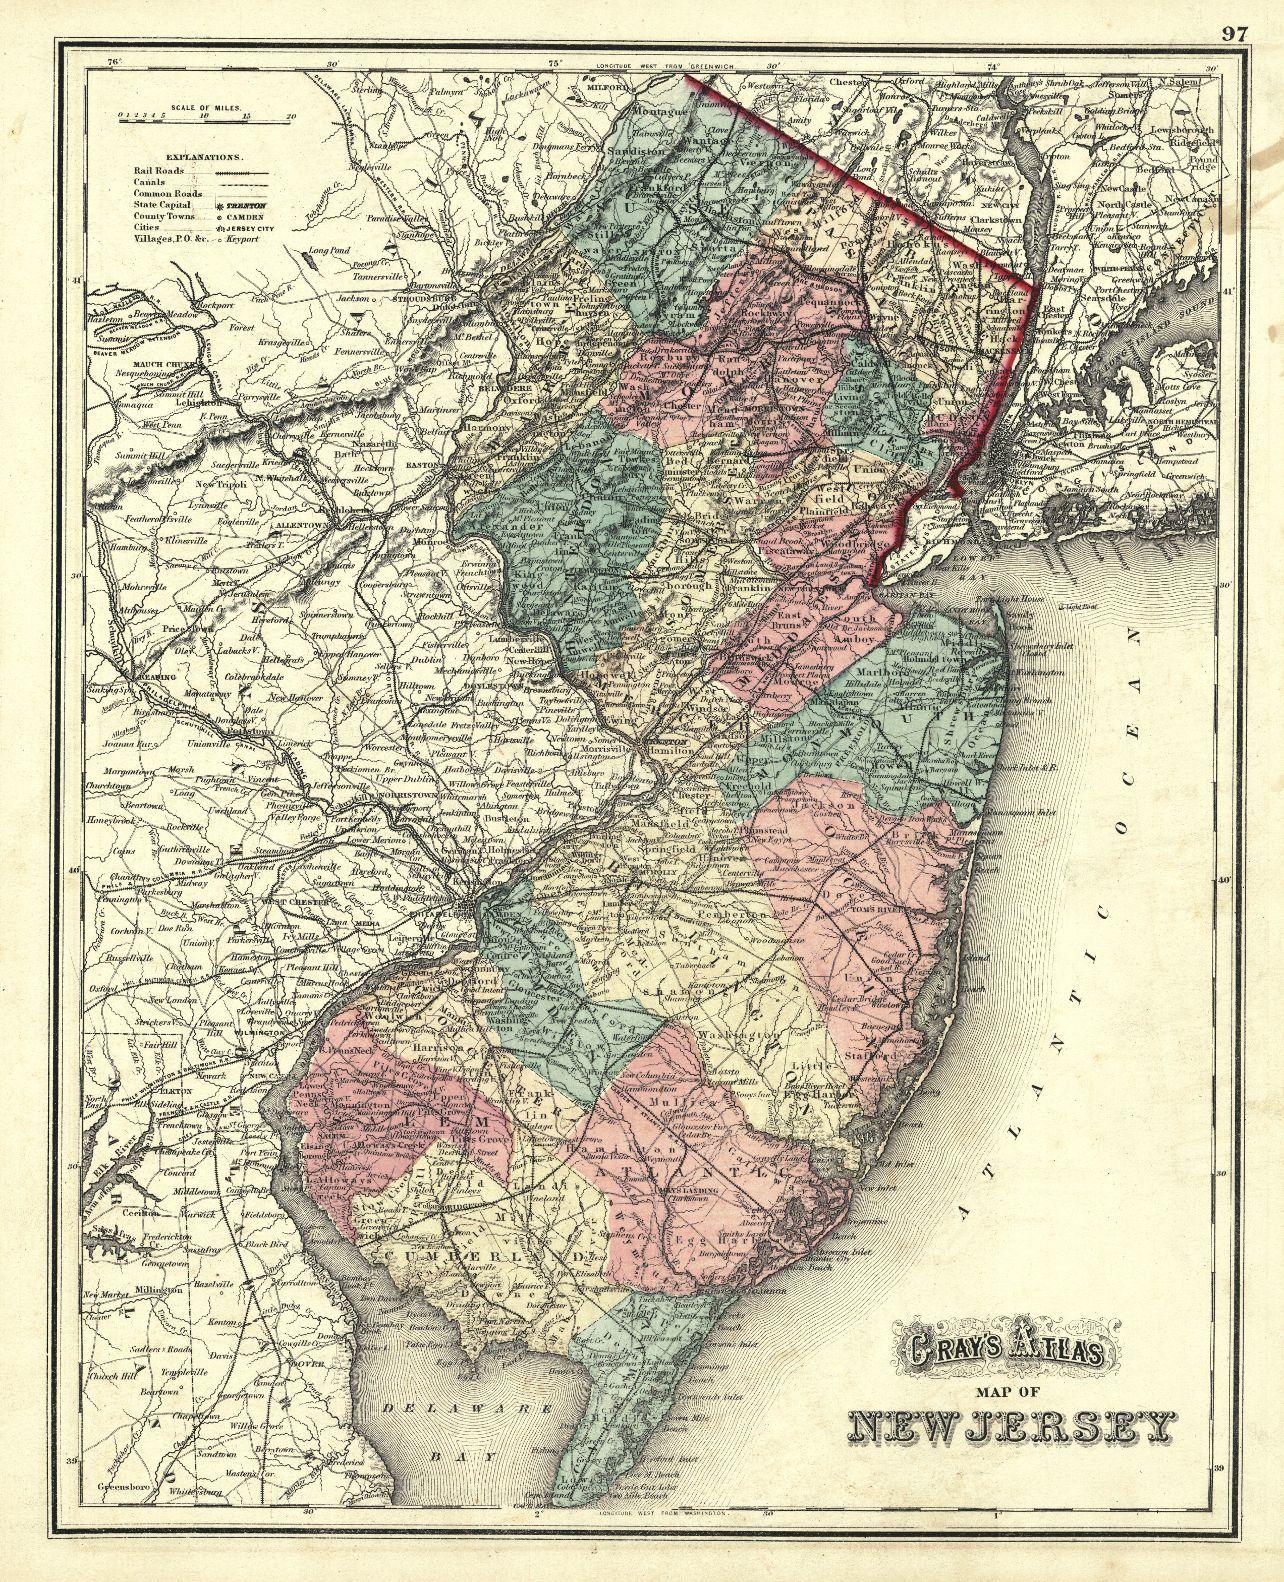 Map Antique Gray S Atlas Map Of New Jersey Stedman Brown Lyon